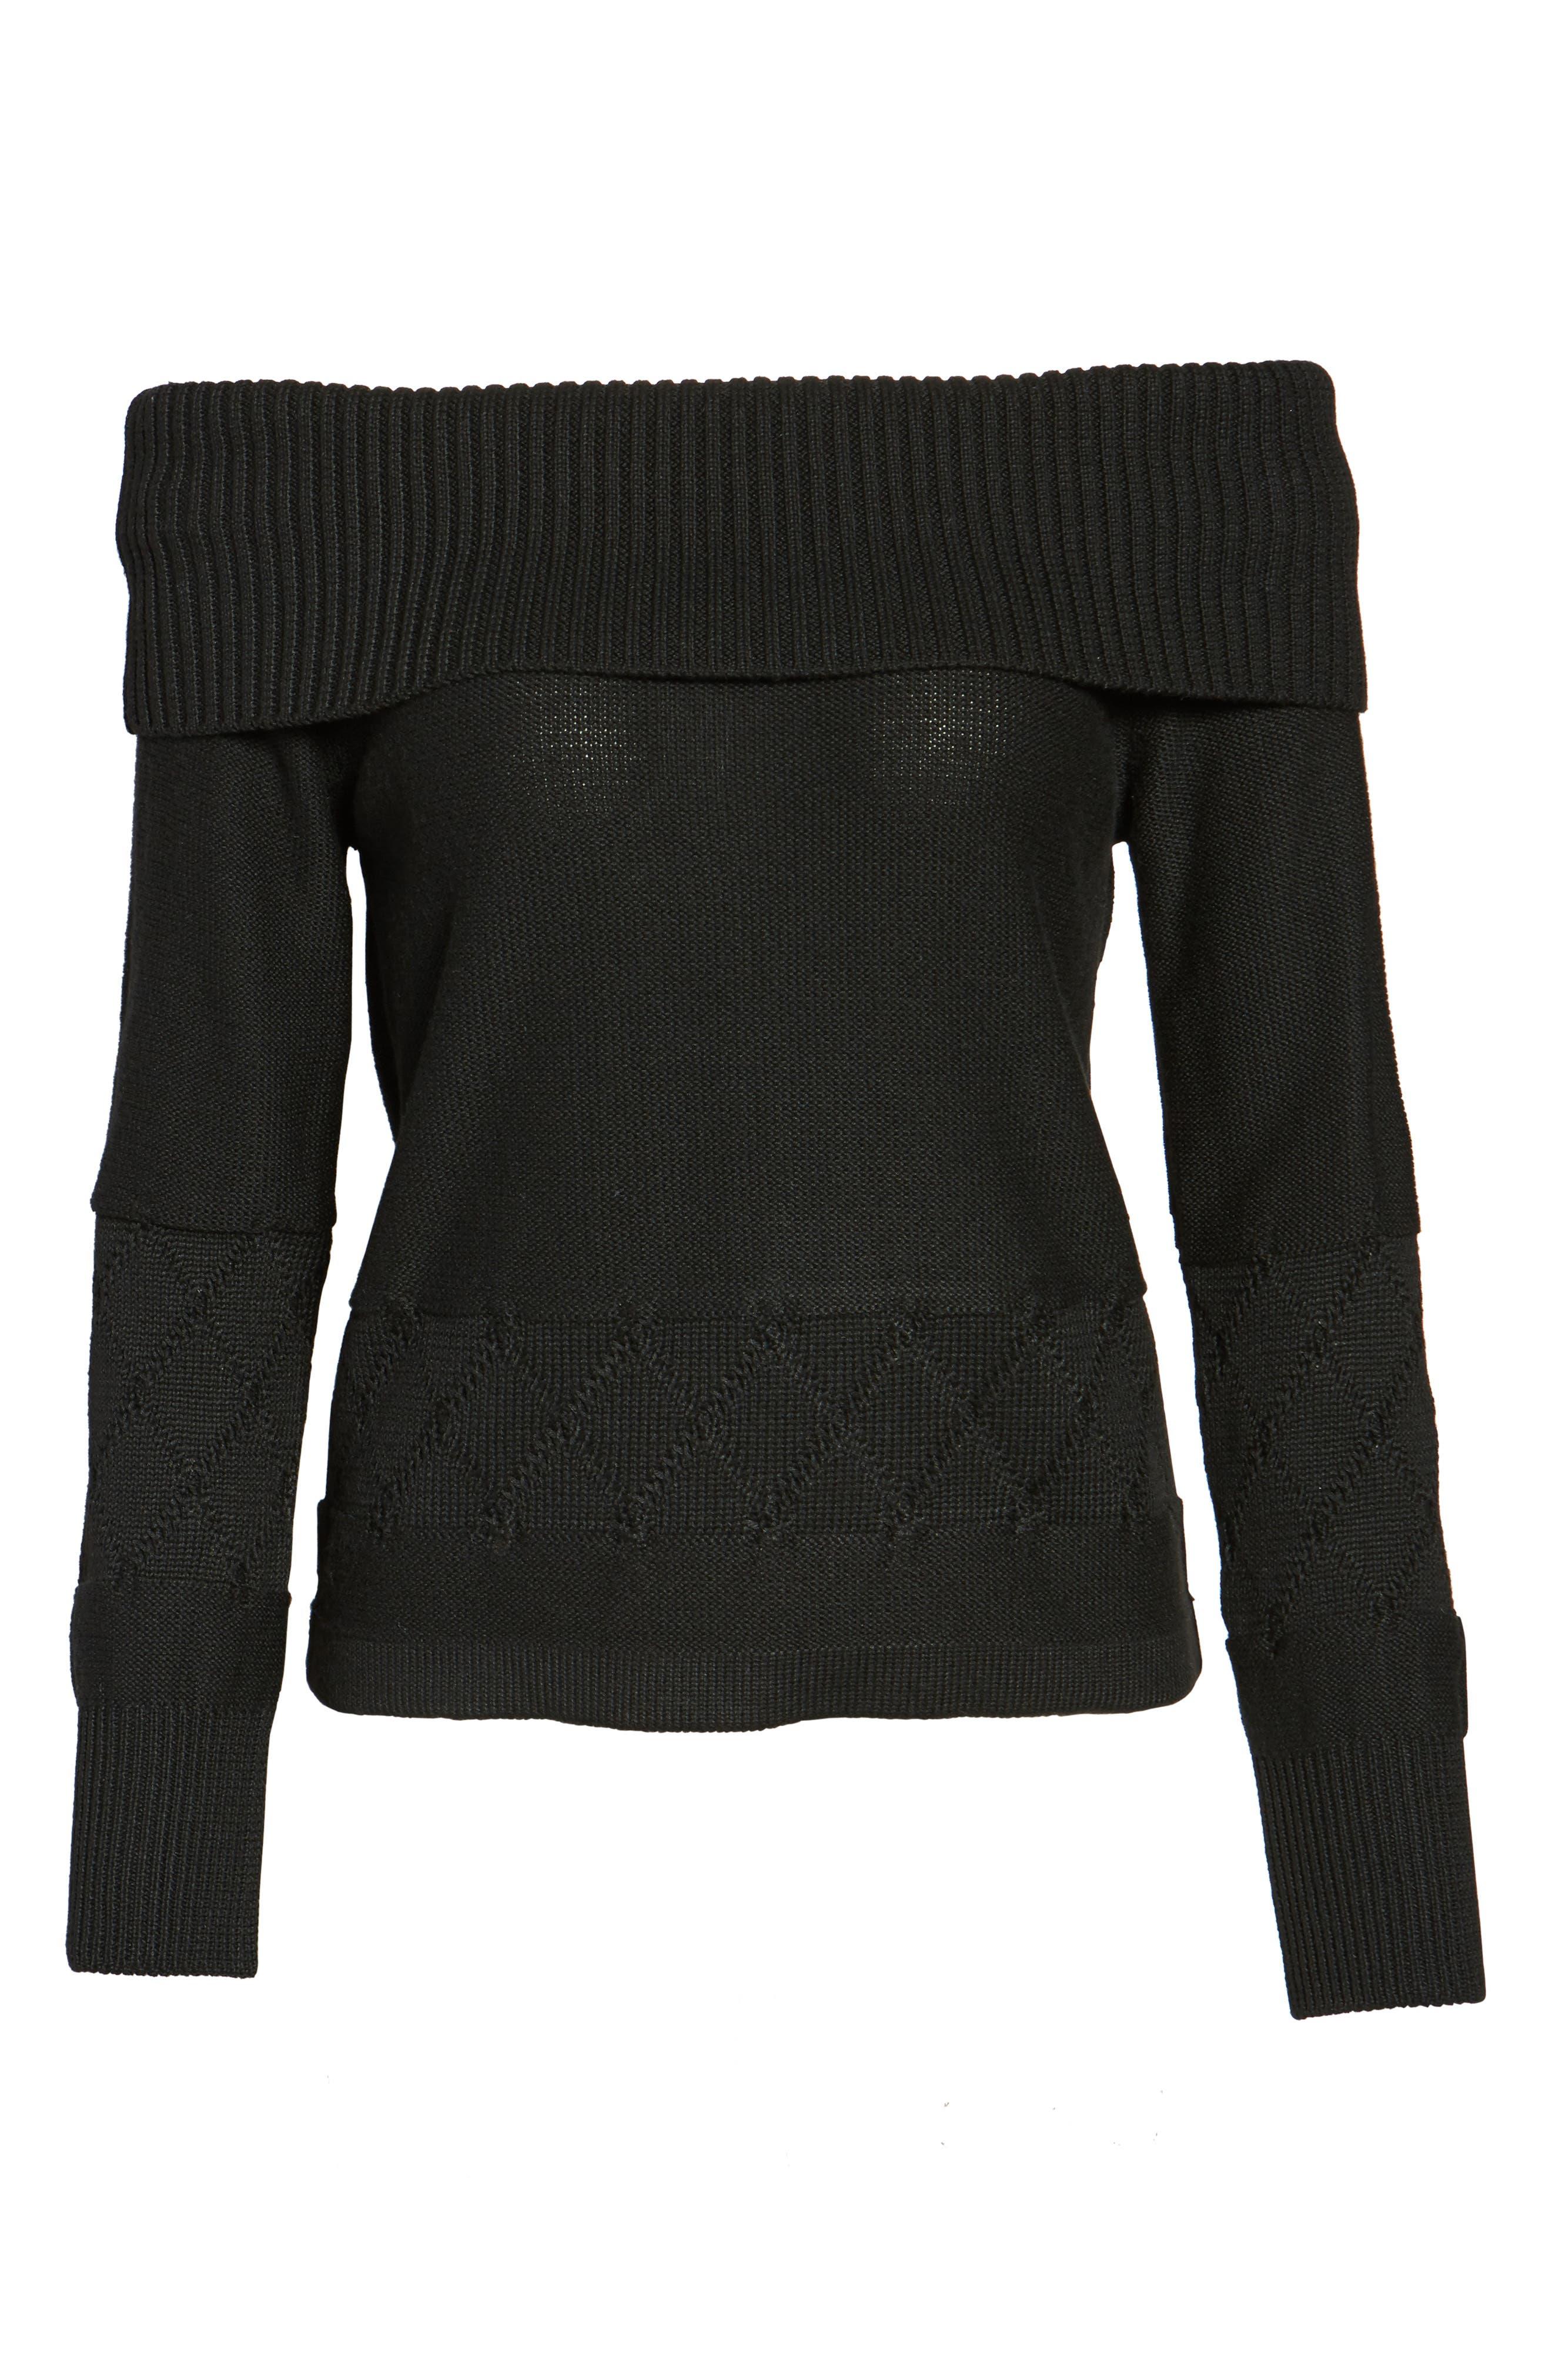 Terri Off the Shoulder Sweater,                             Alternate thumbnail 6, color,                             001